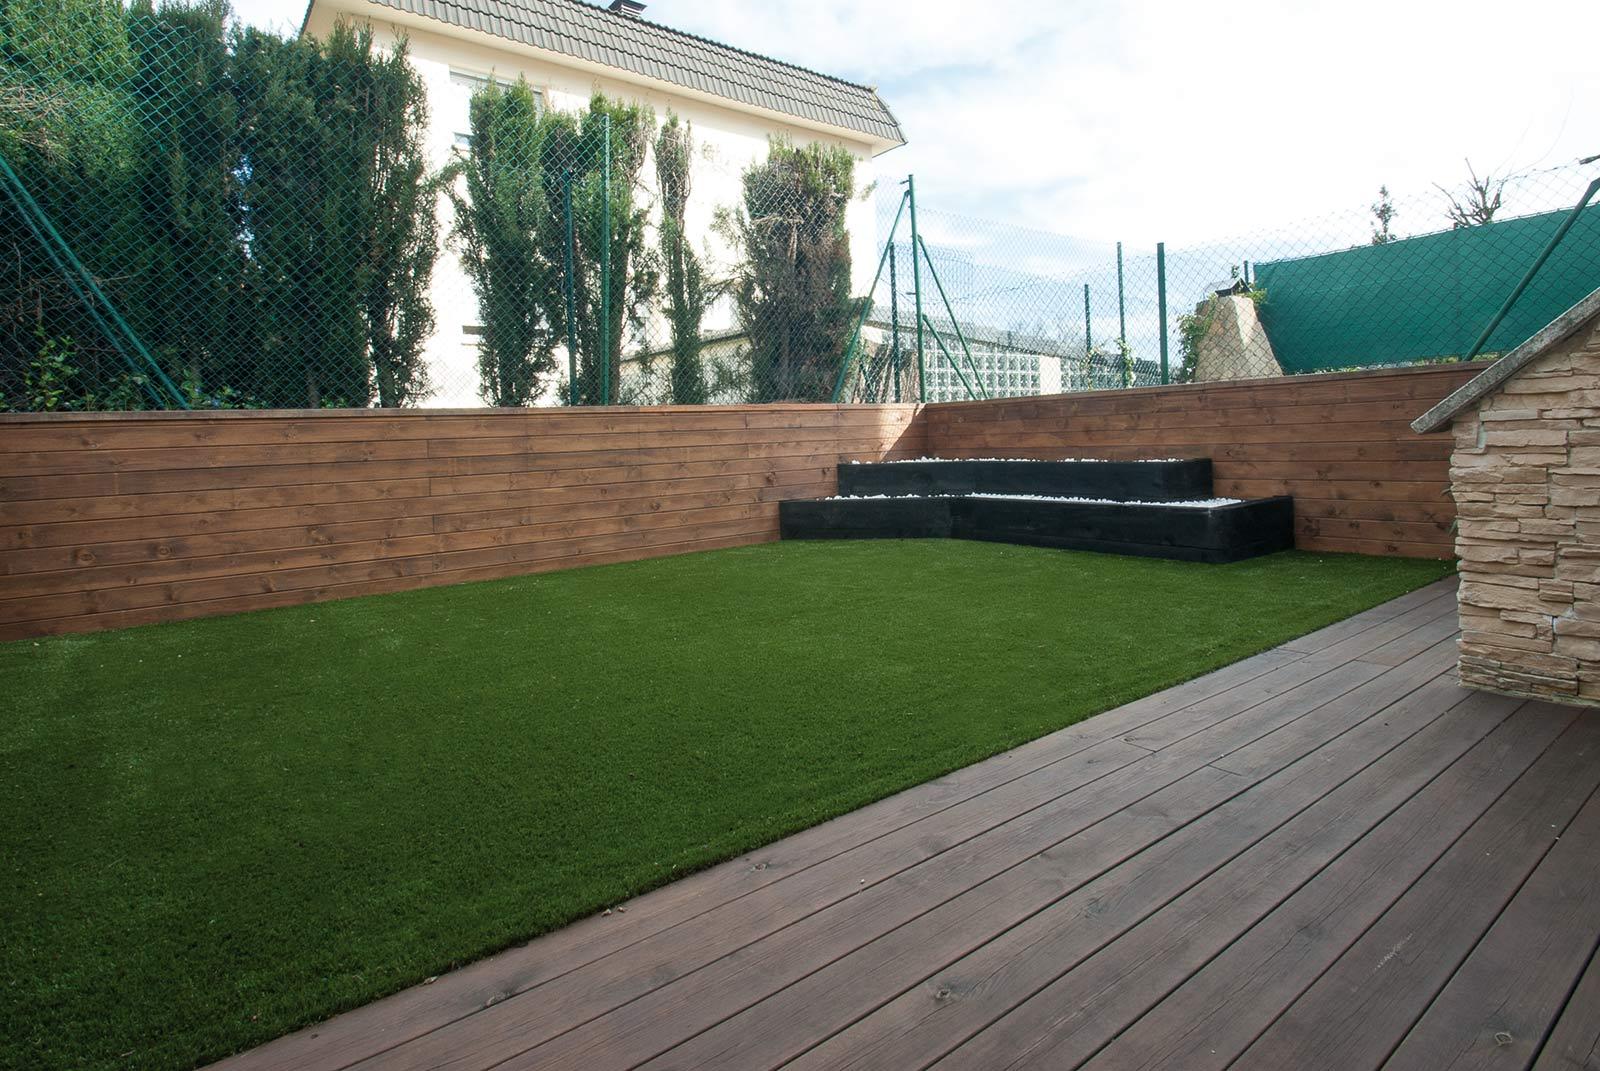 jardin-cespe-artificial-tarima-traviesas-3